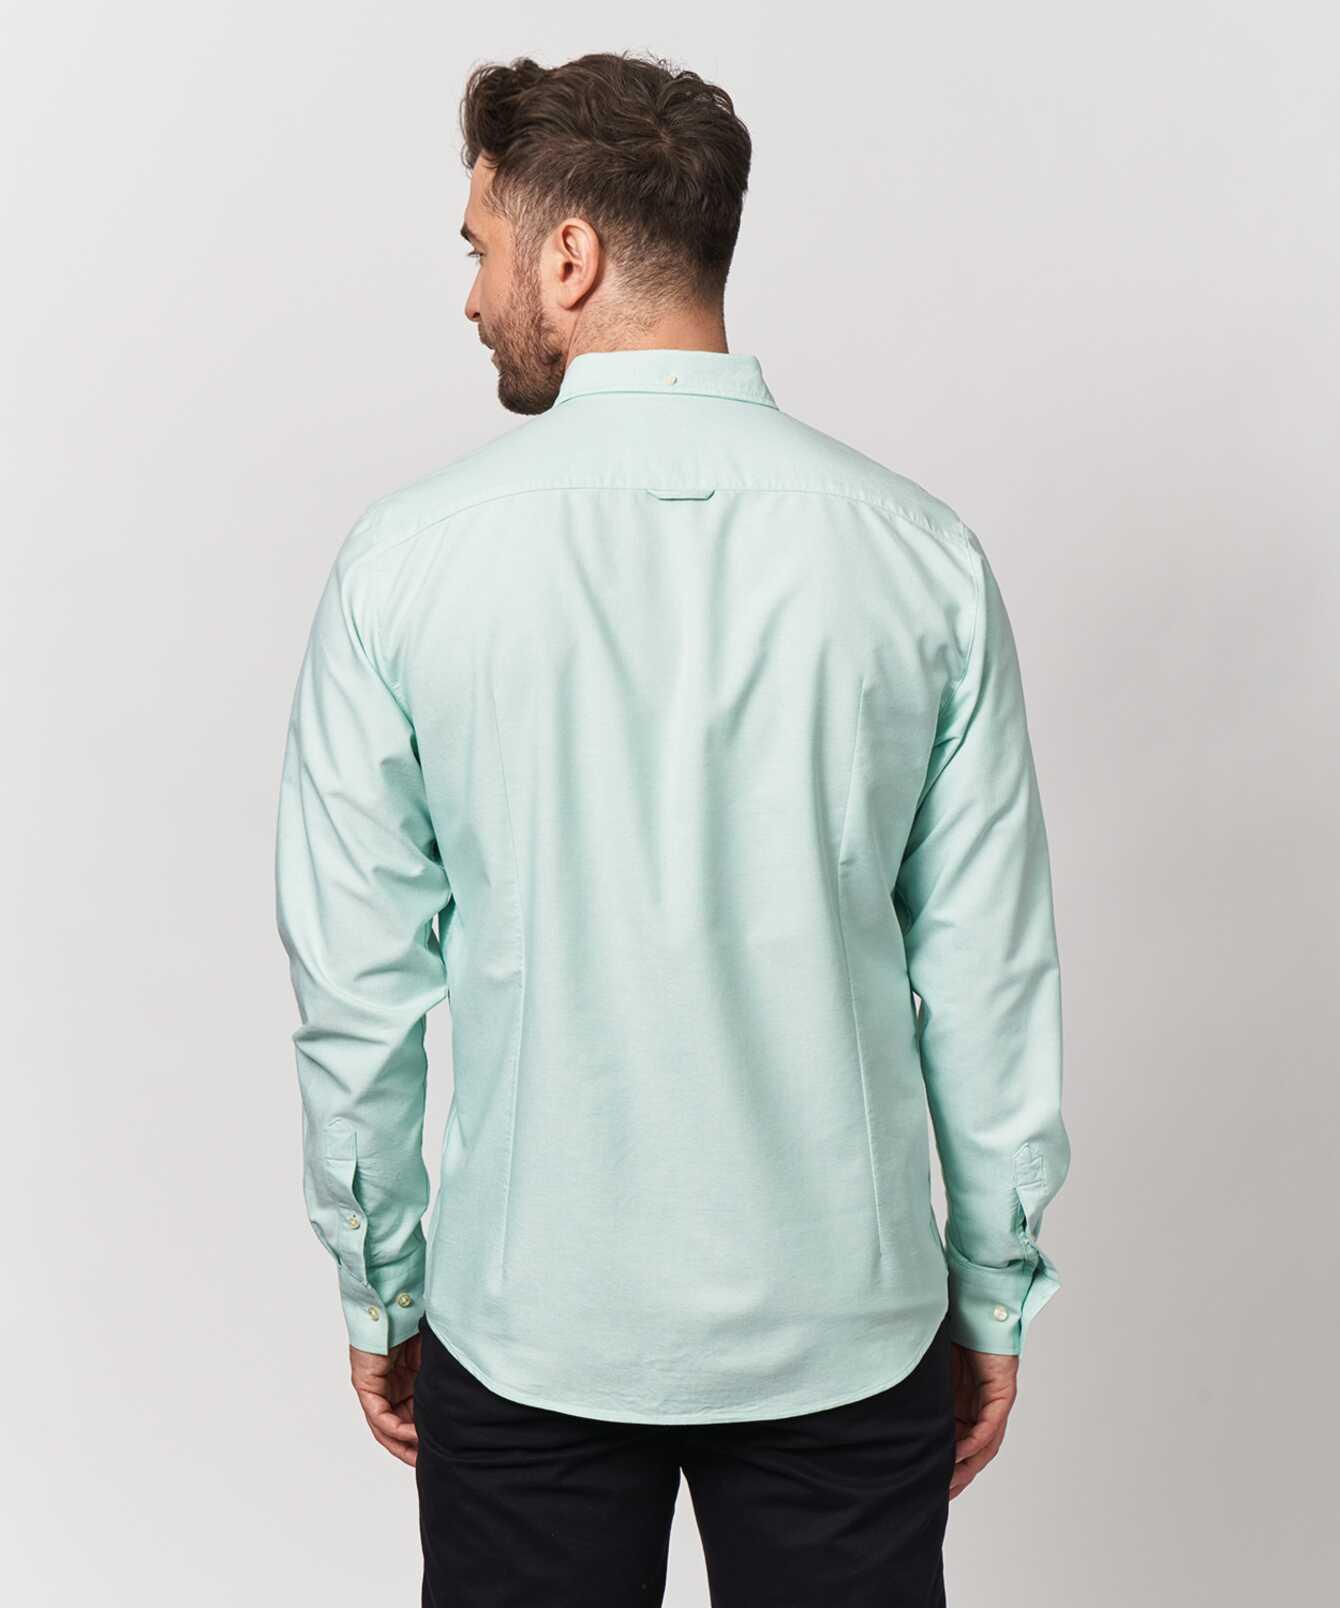 Skjorta Boston Oxford Ljusgrön The Shirt Factory